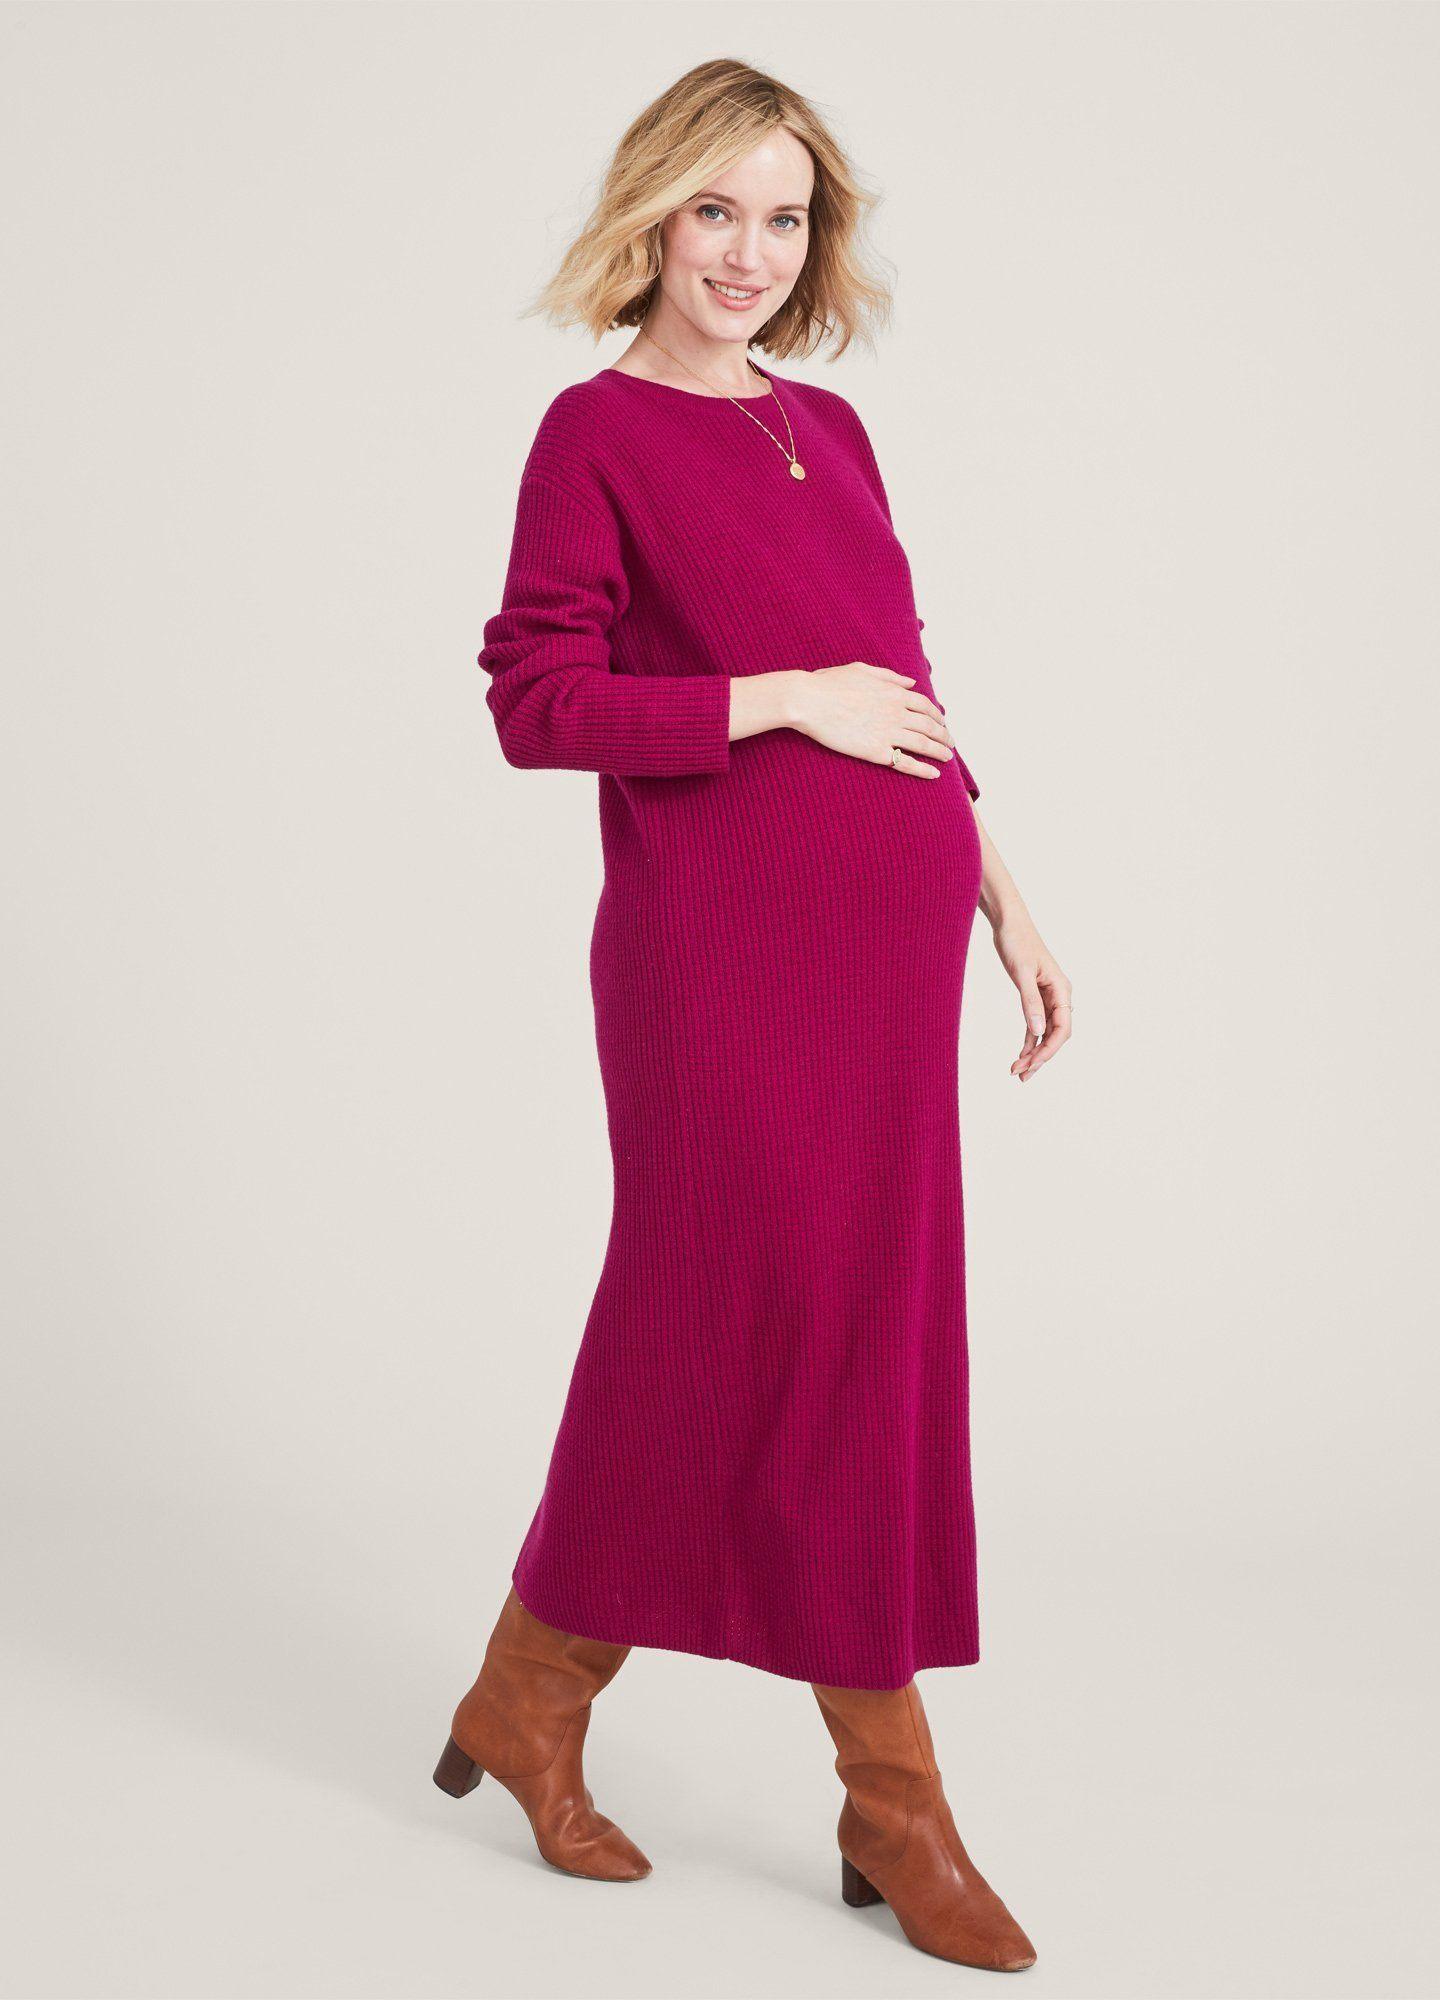 HATCH Maternity The Cozy Waffle Dress, magenta, Size 0